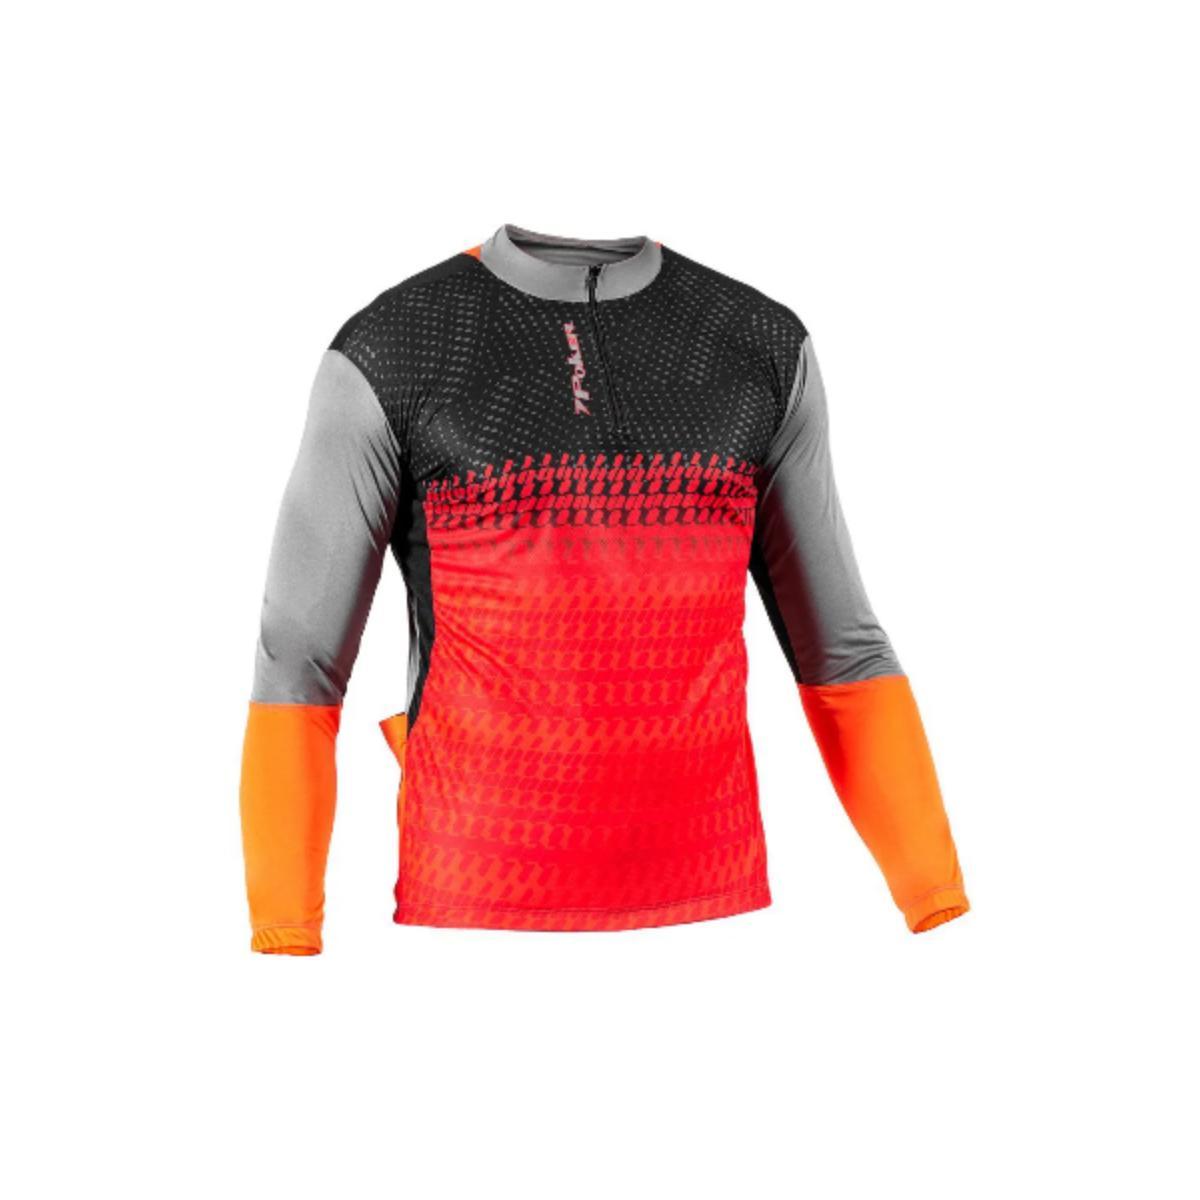 Camisa Masculina Poker 04088 Freeride ii C/ziper Preto/laranja